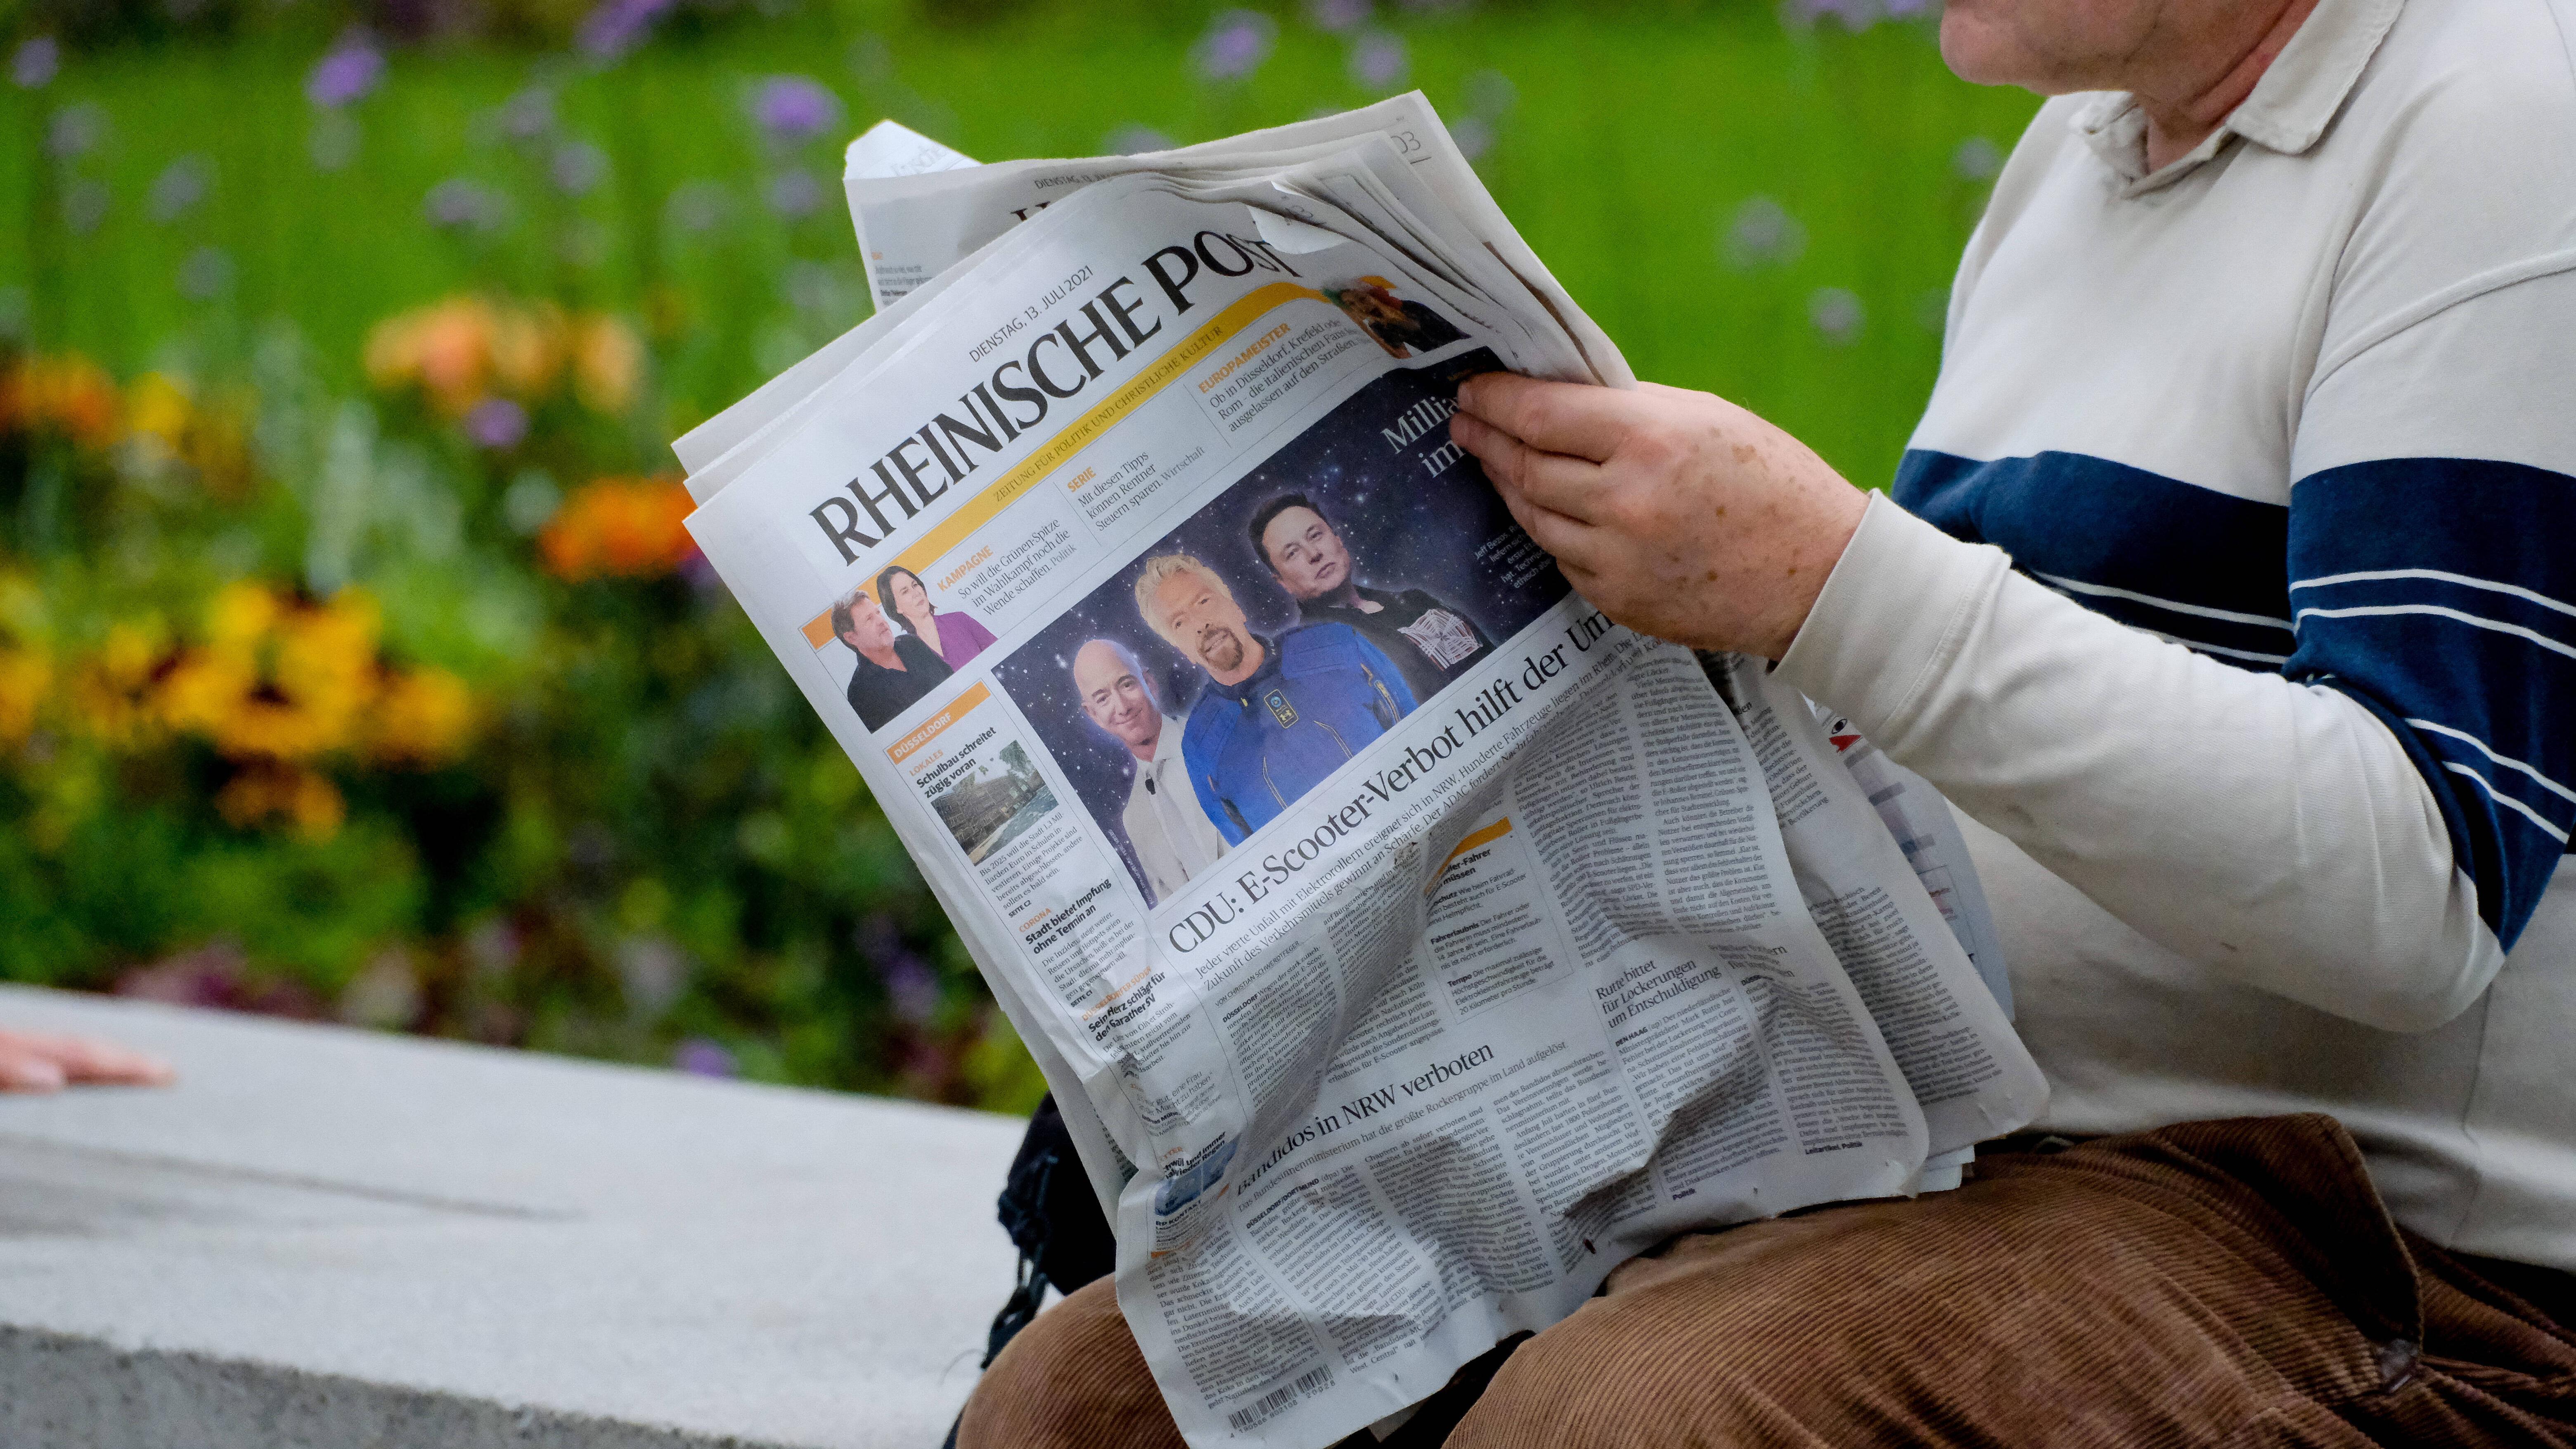 Rheinische Post kündigen – so geht's